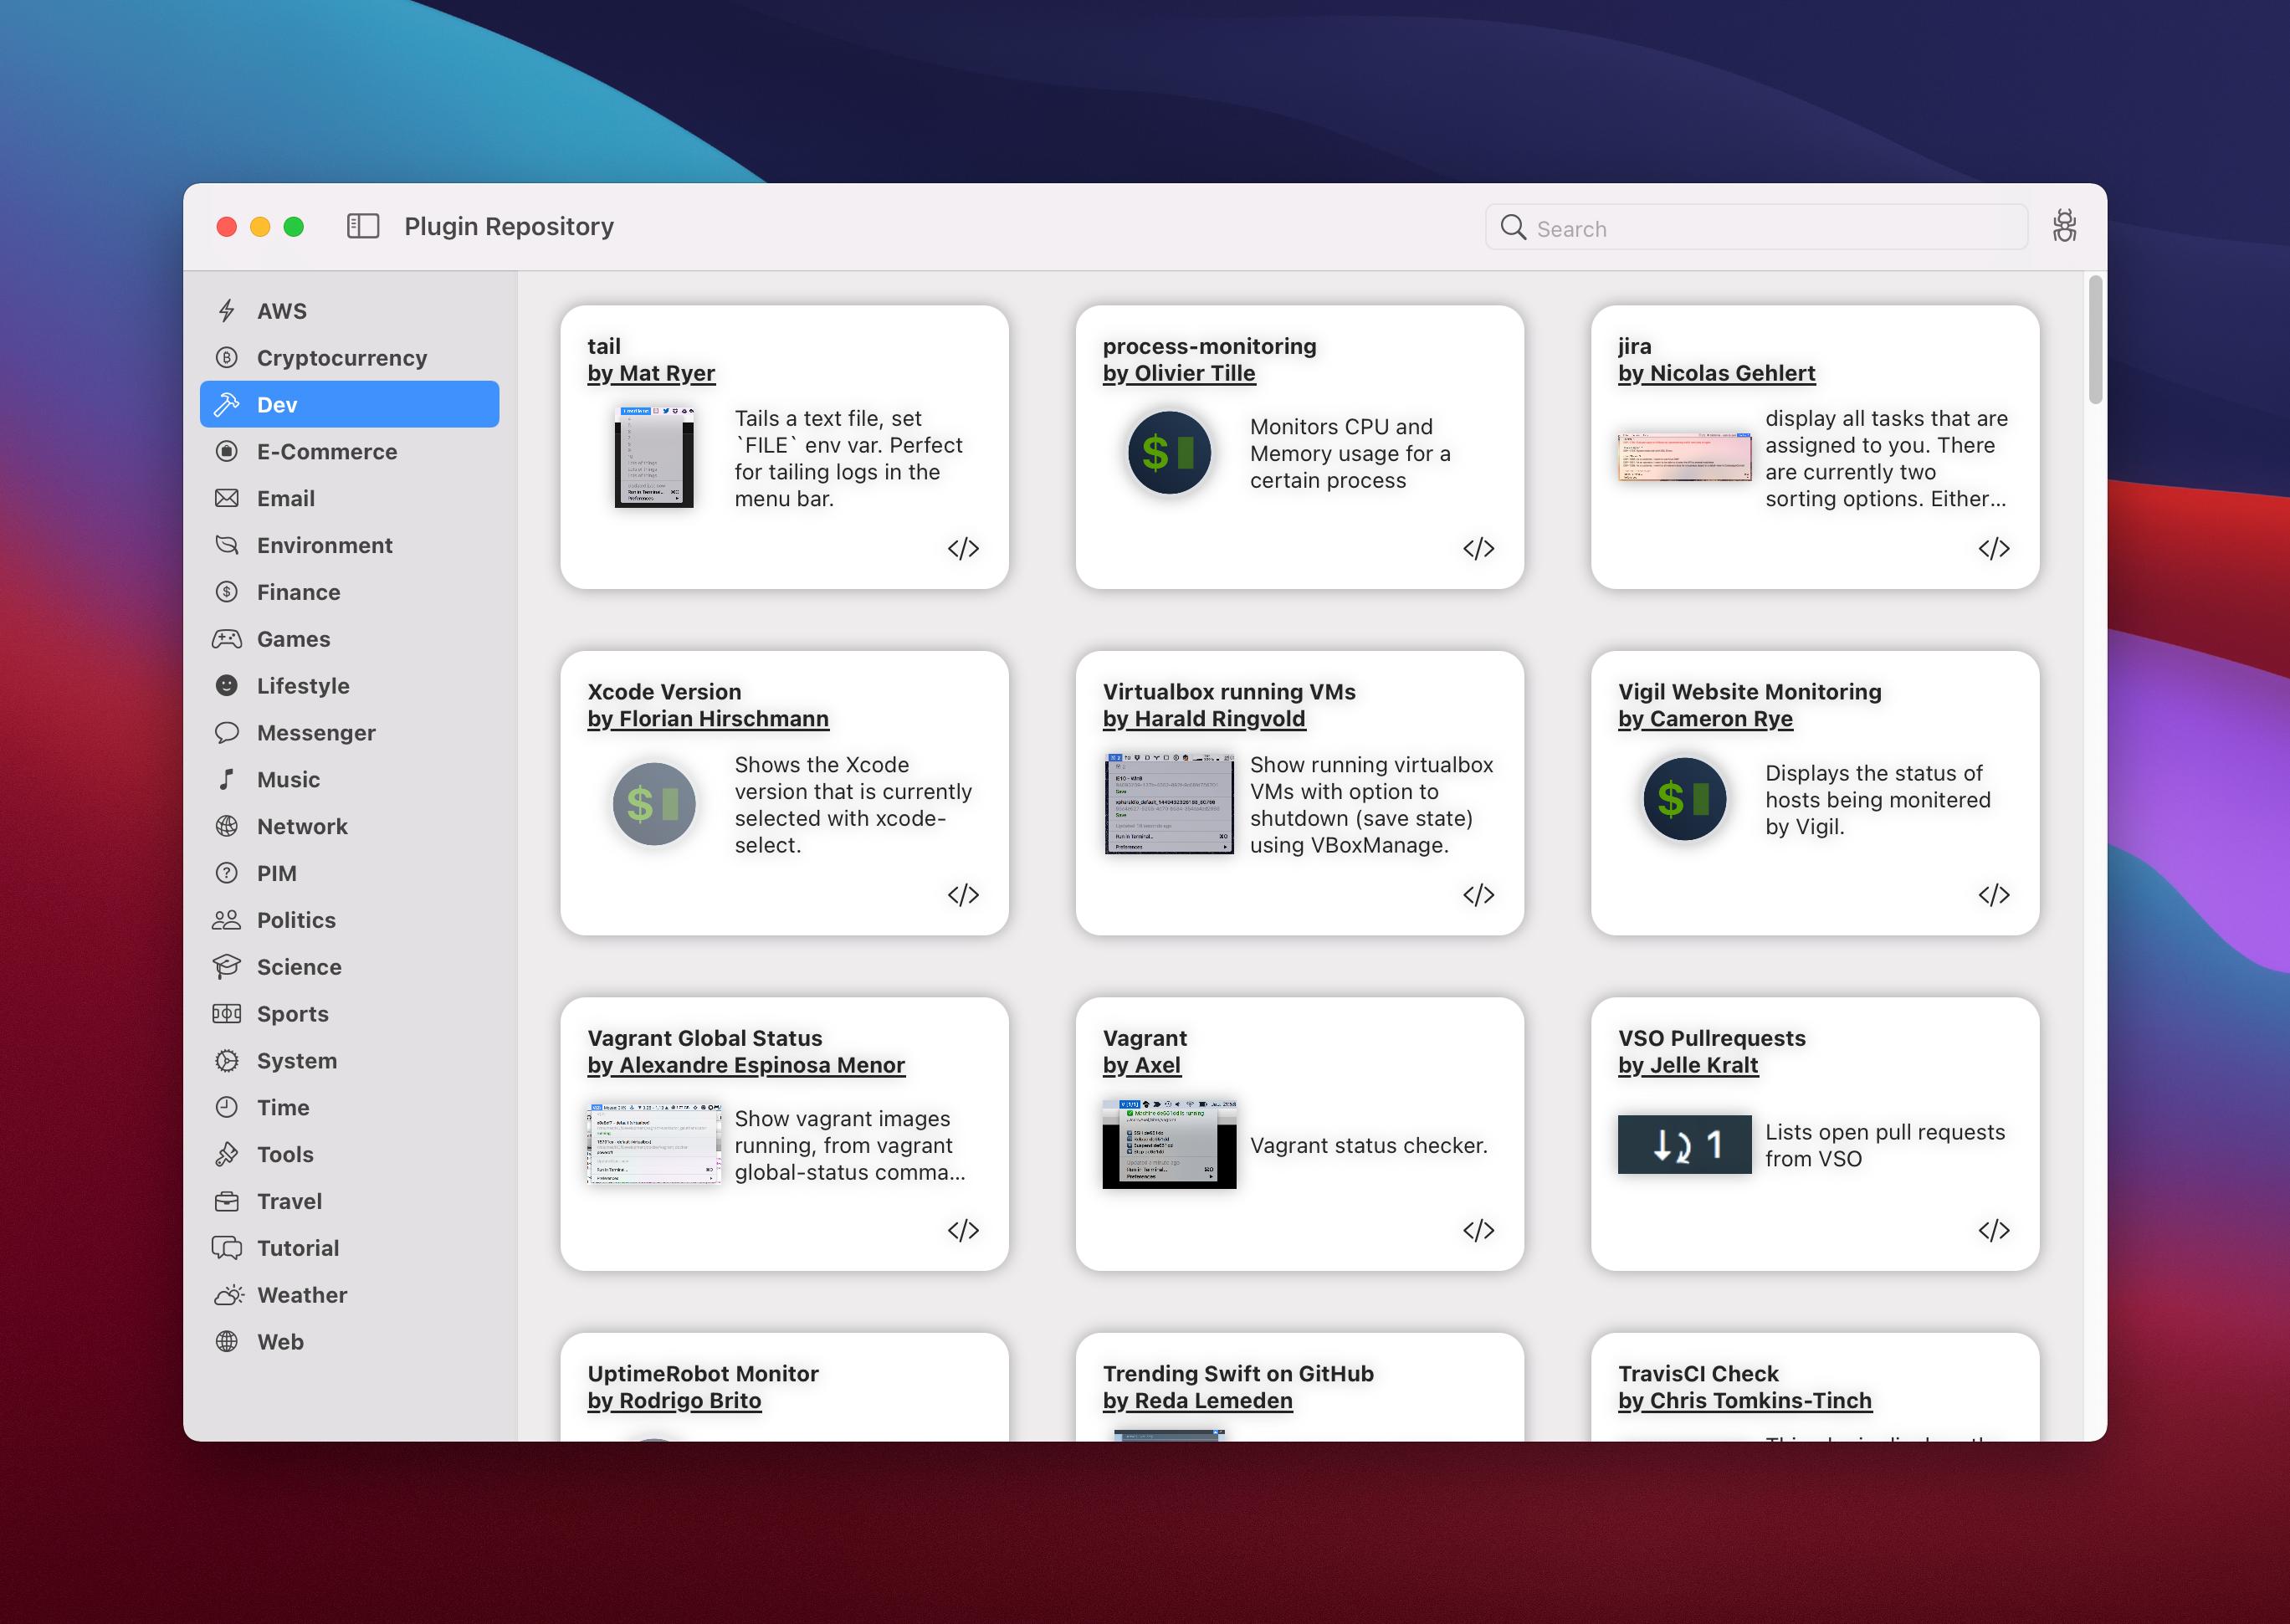 A screenshot of SwiftBar's Plugin Repository